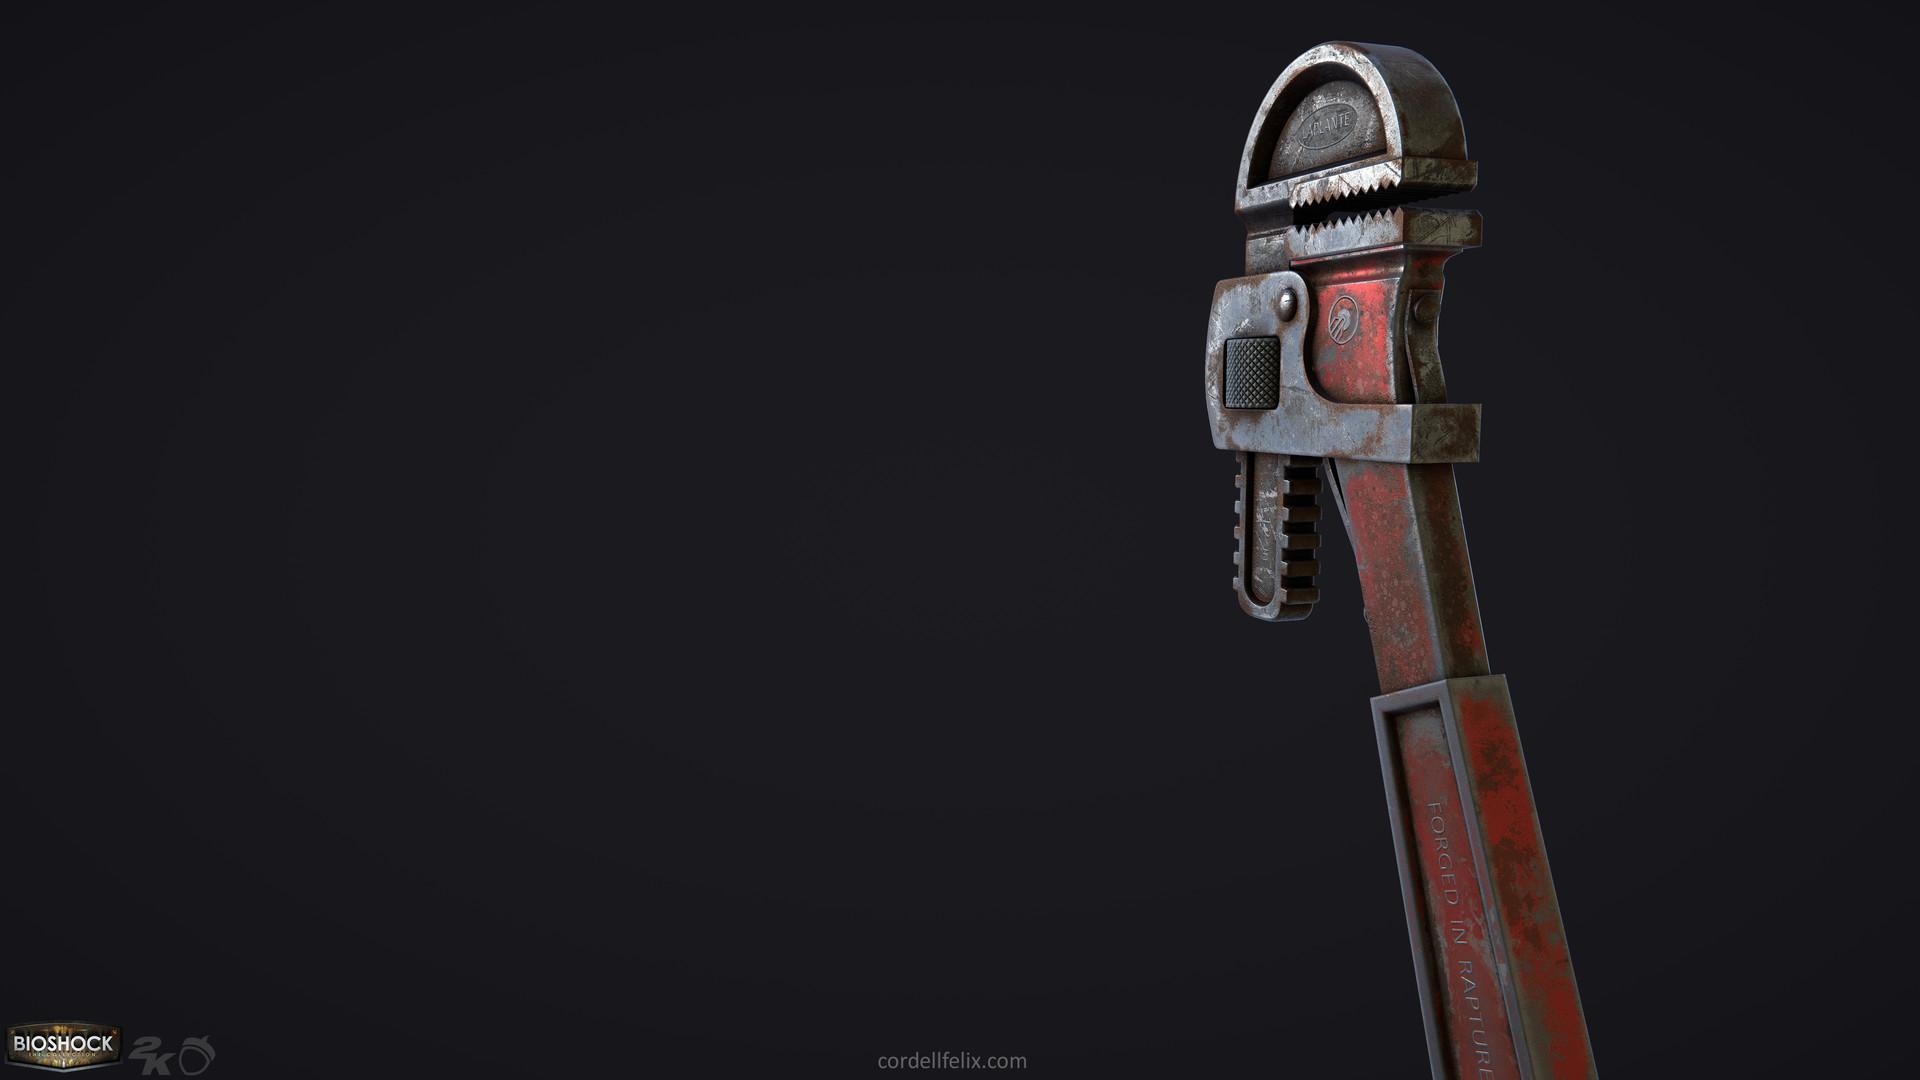 Cordell felix cordellfelix bioshock wrench 02